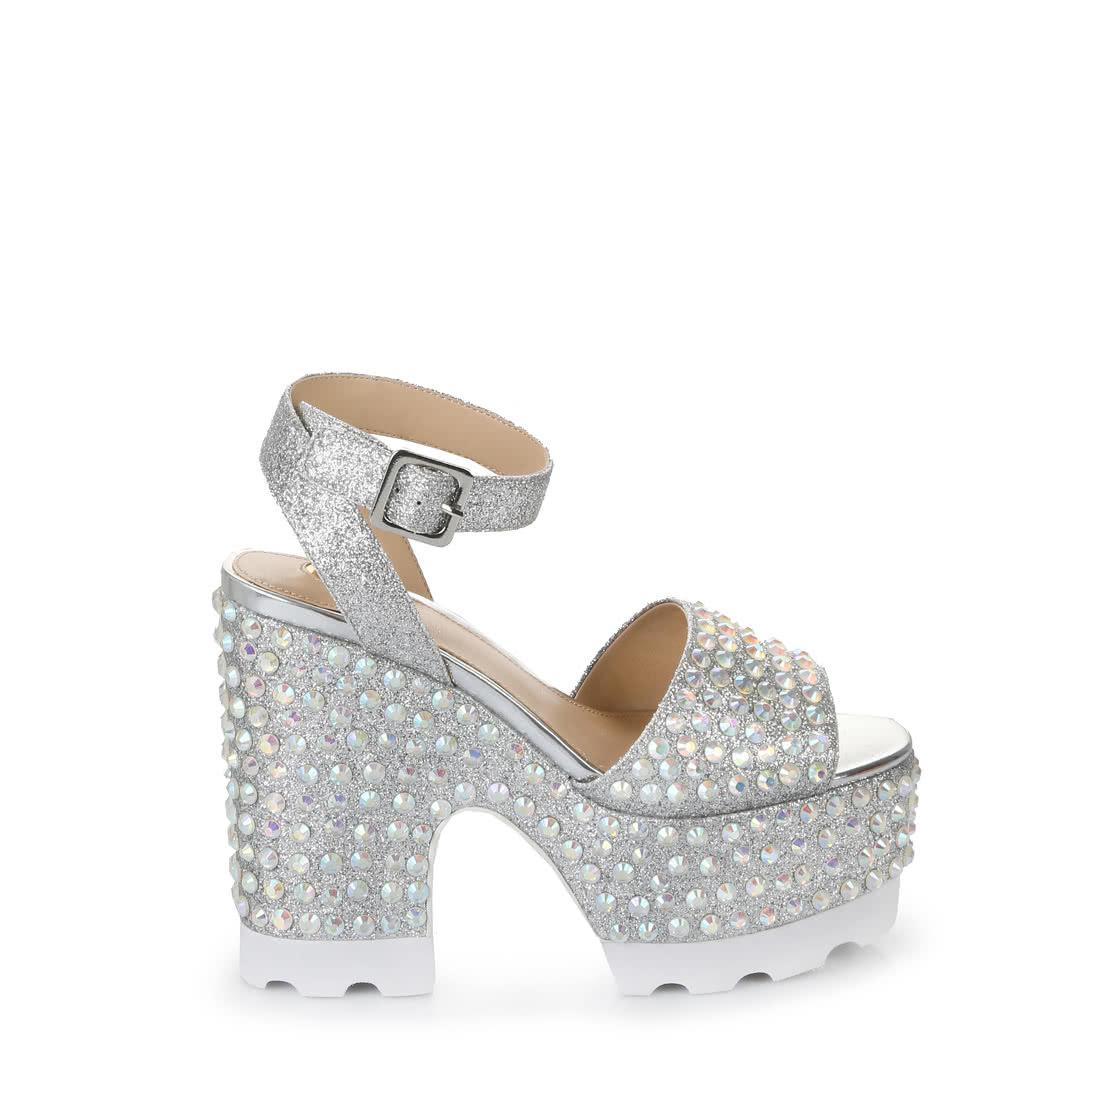 eeec4a81c64408 BUFFALO Buffalo high-heeled sandals in silver glitter effect